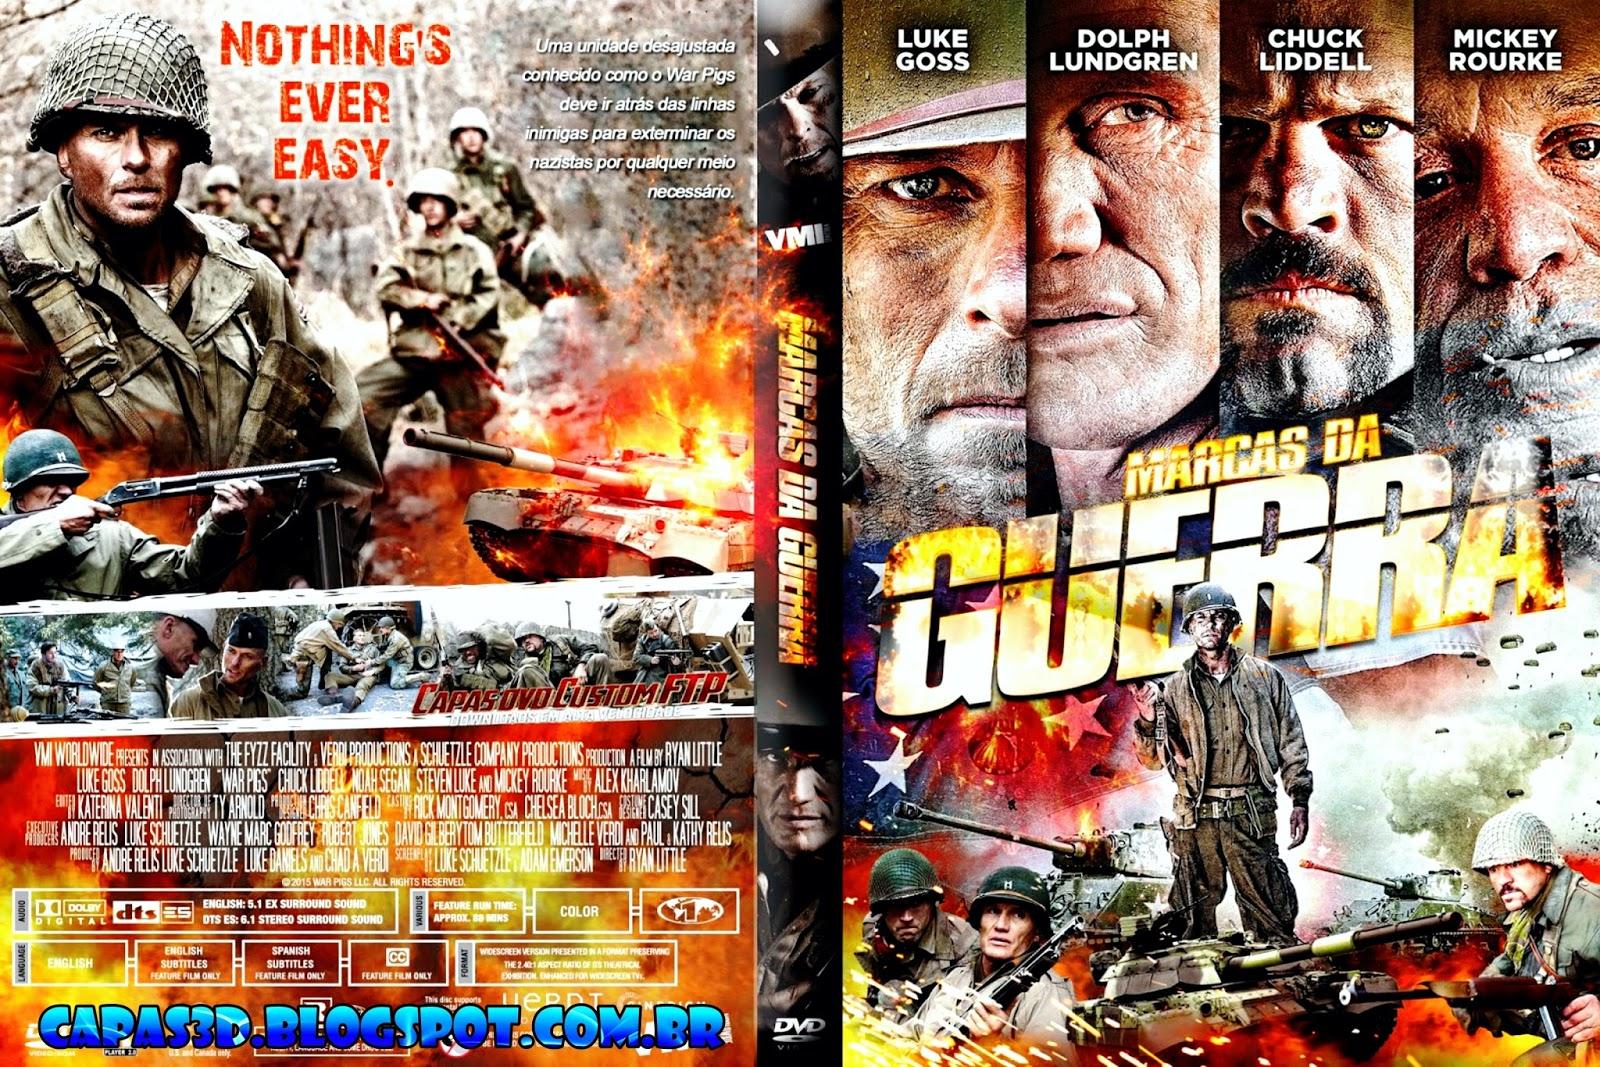 Filme Marcas Da Guerra in marcas da guerra - war pigs (2016) capa dvd - giga in filmes